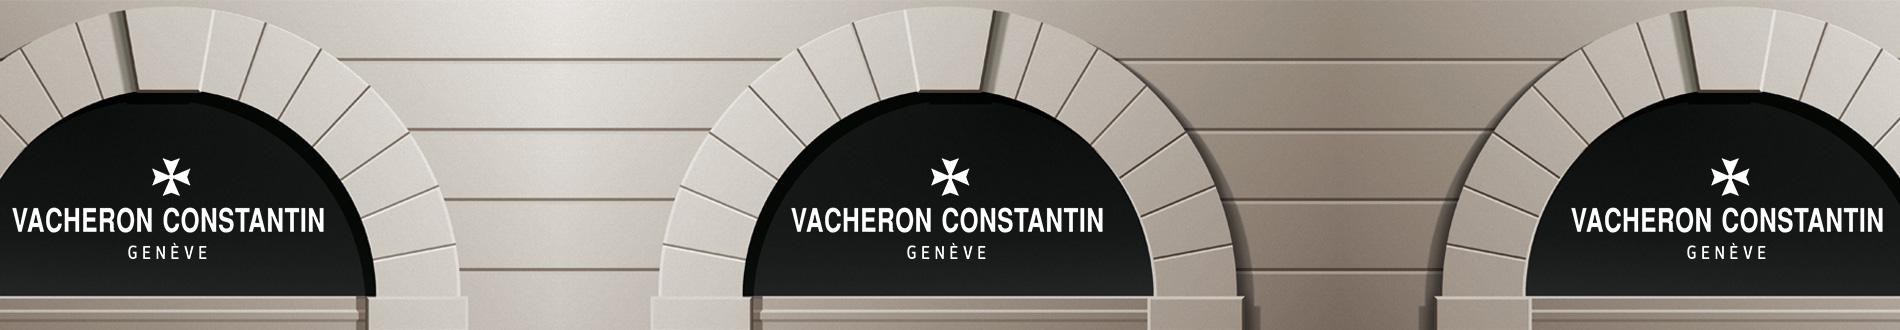 Vacheron Constantin